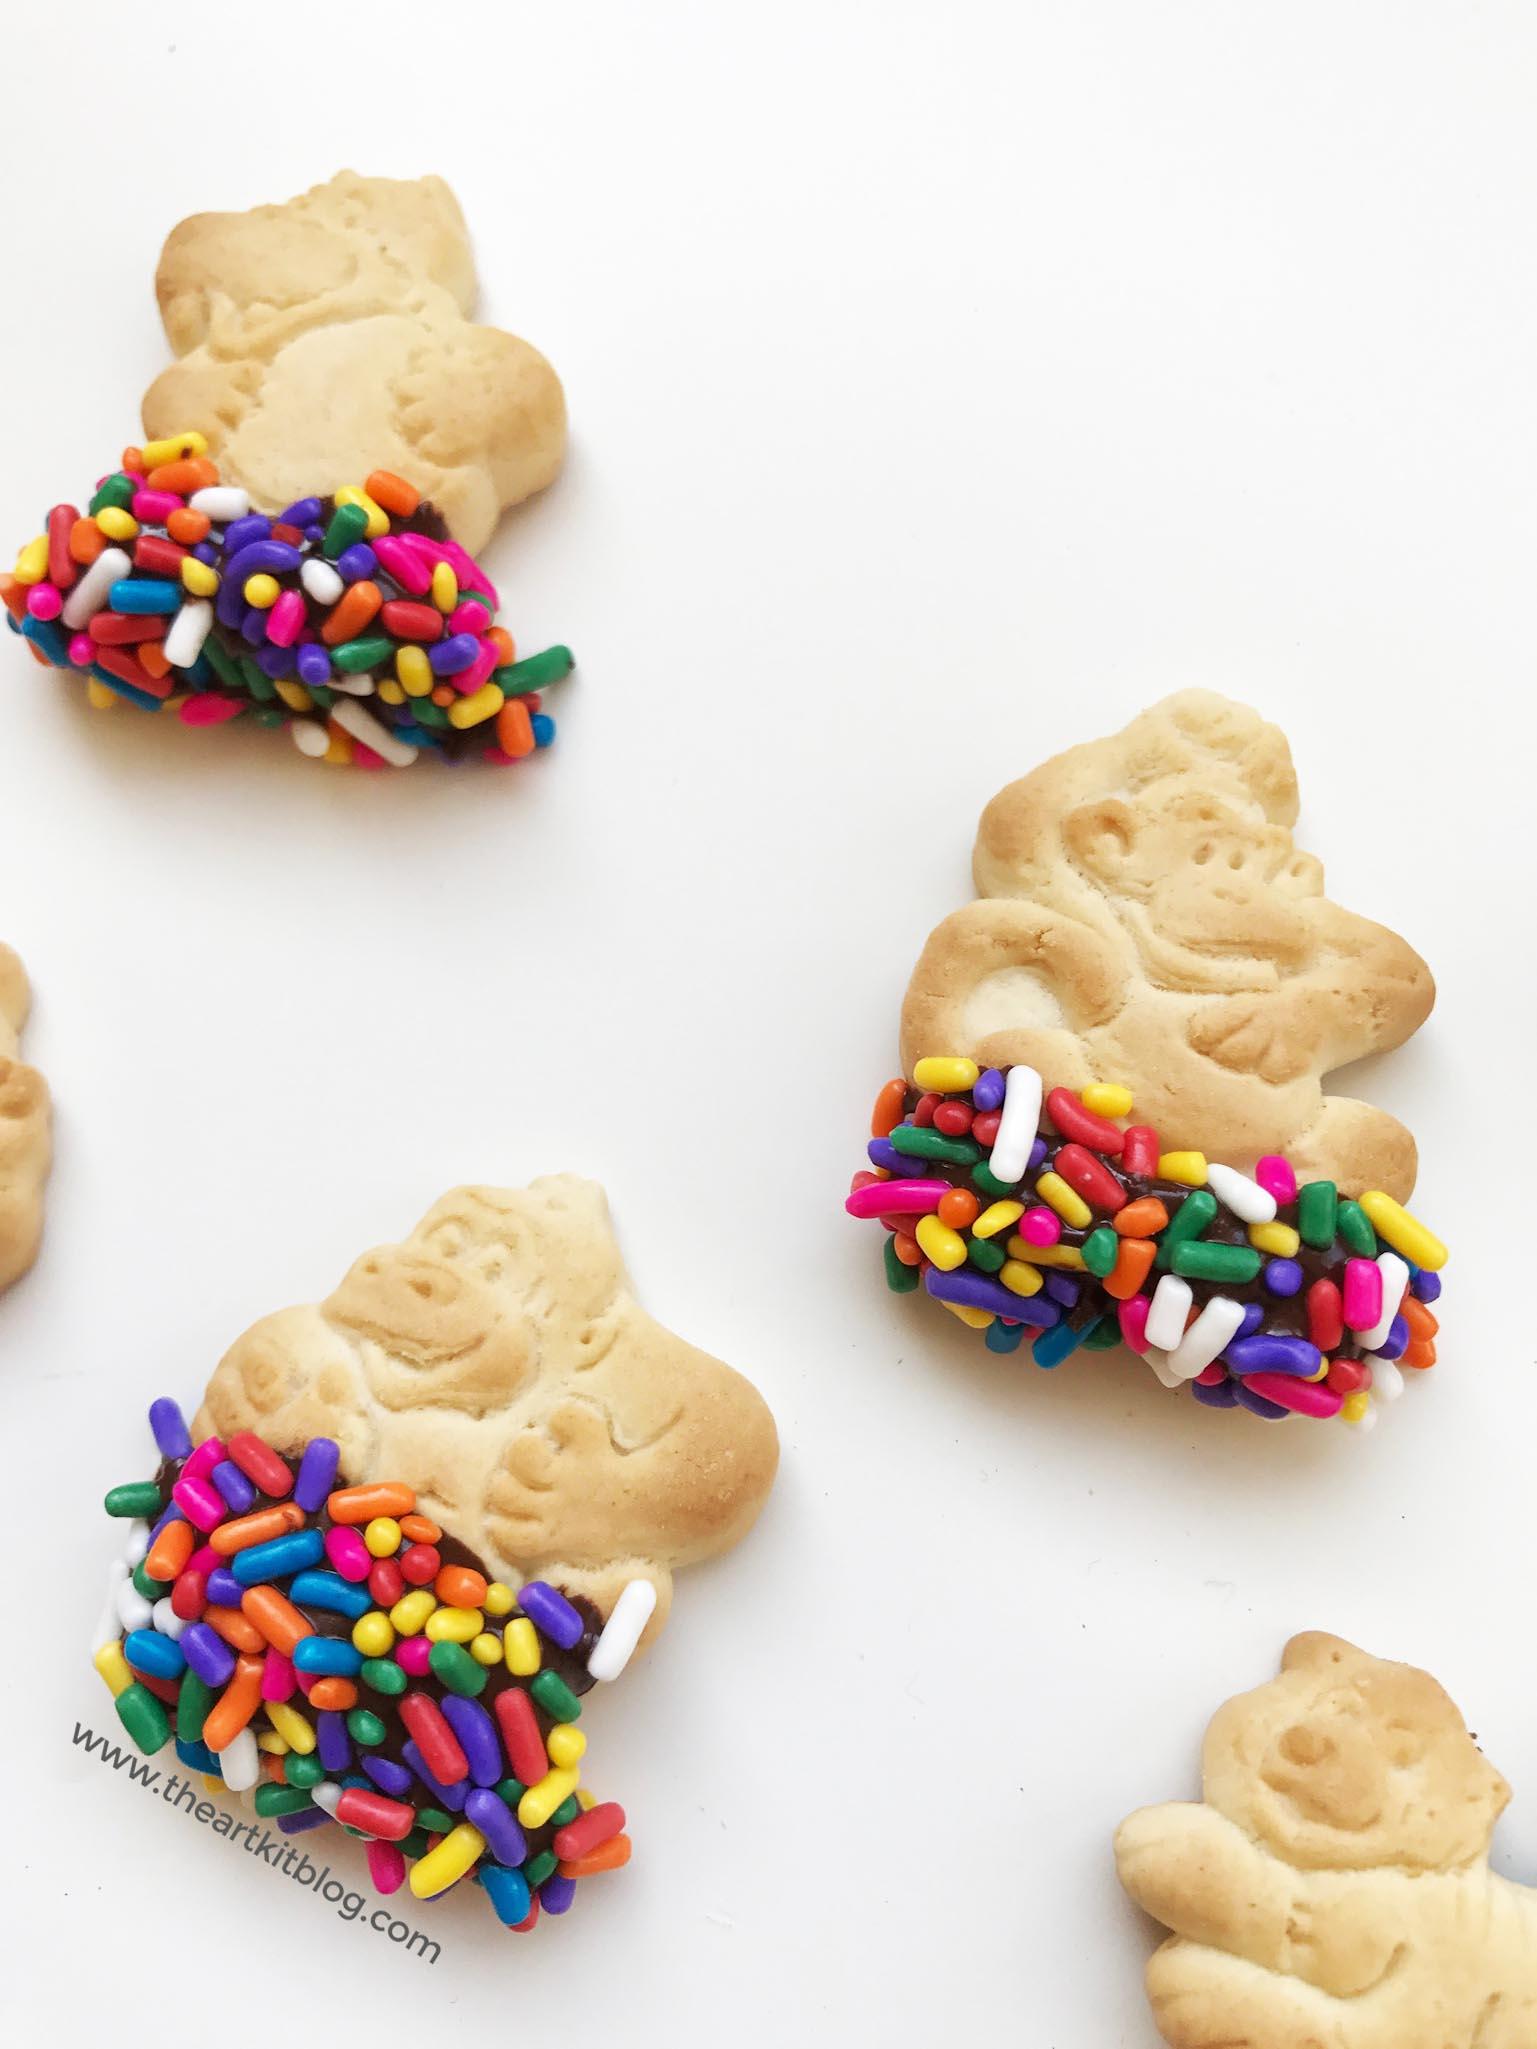 chocolate dipped animal crackers sprinkles cookies costco